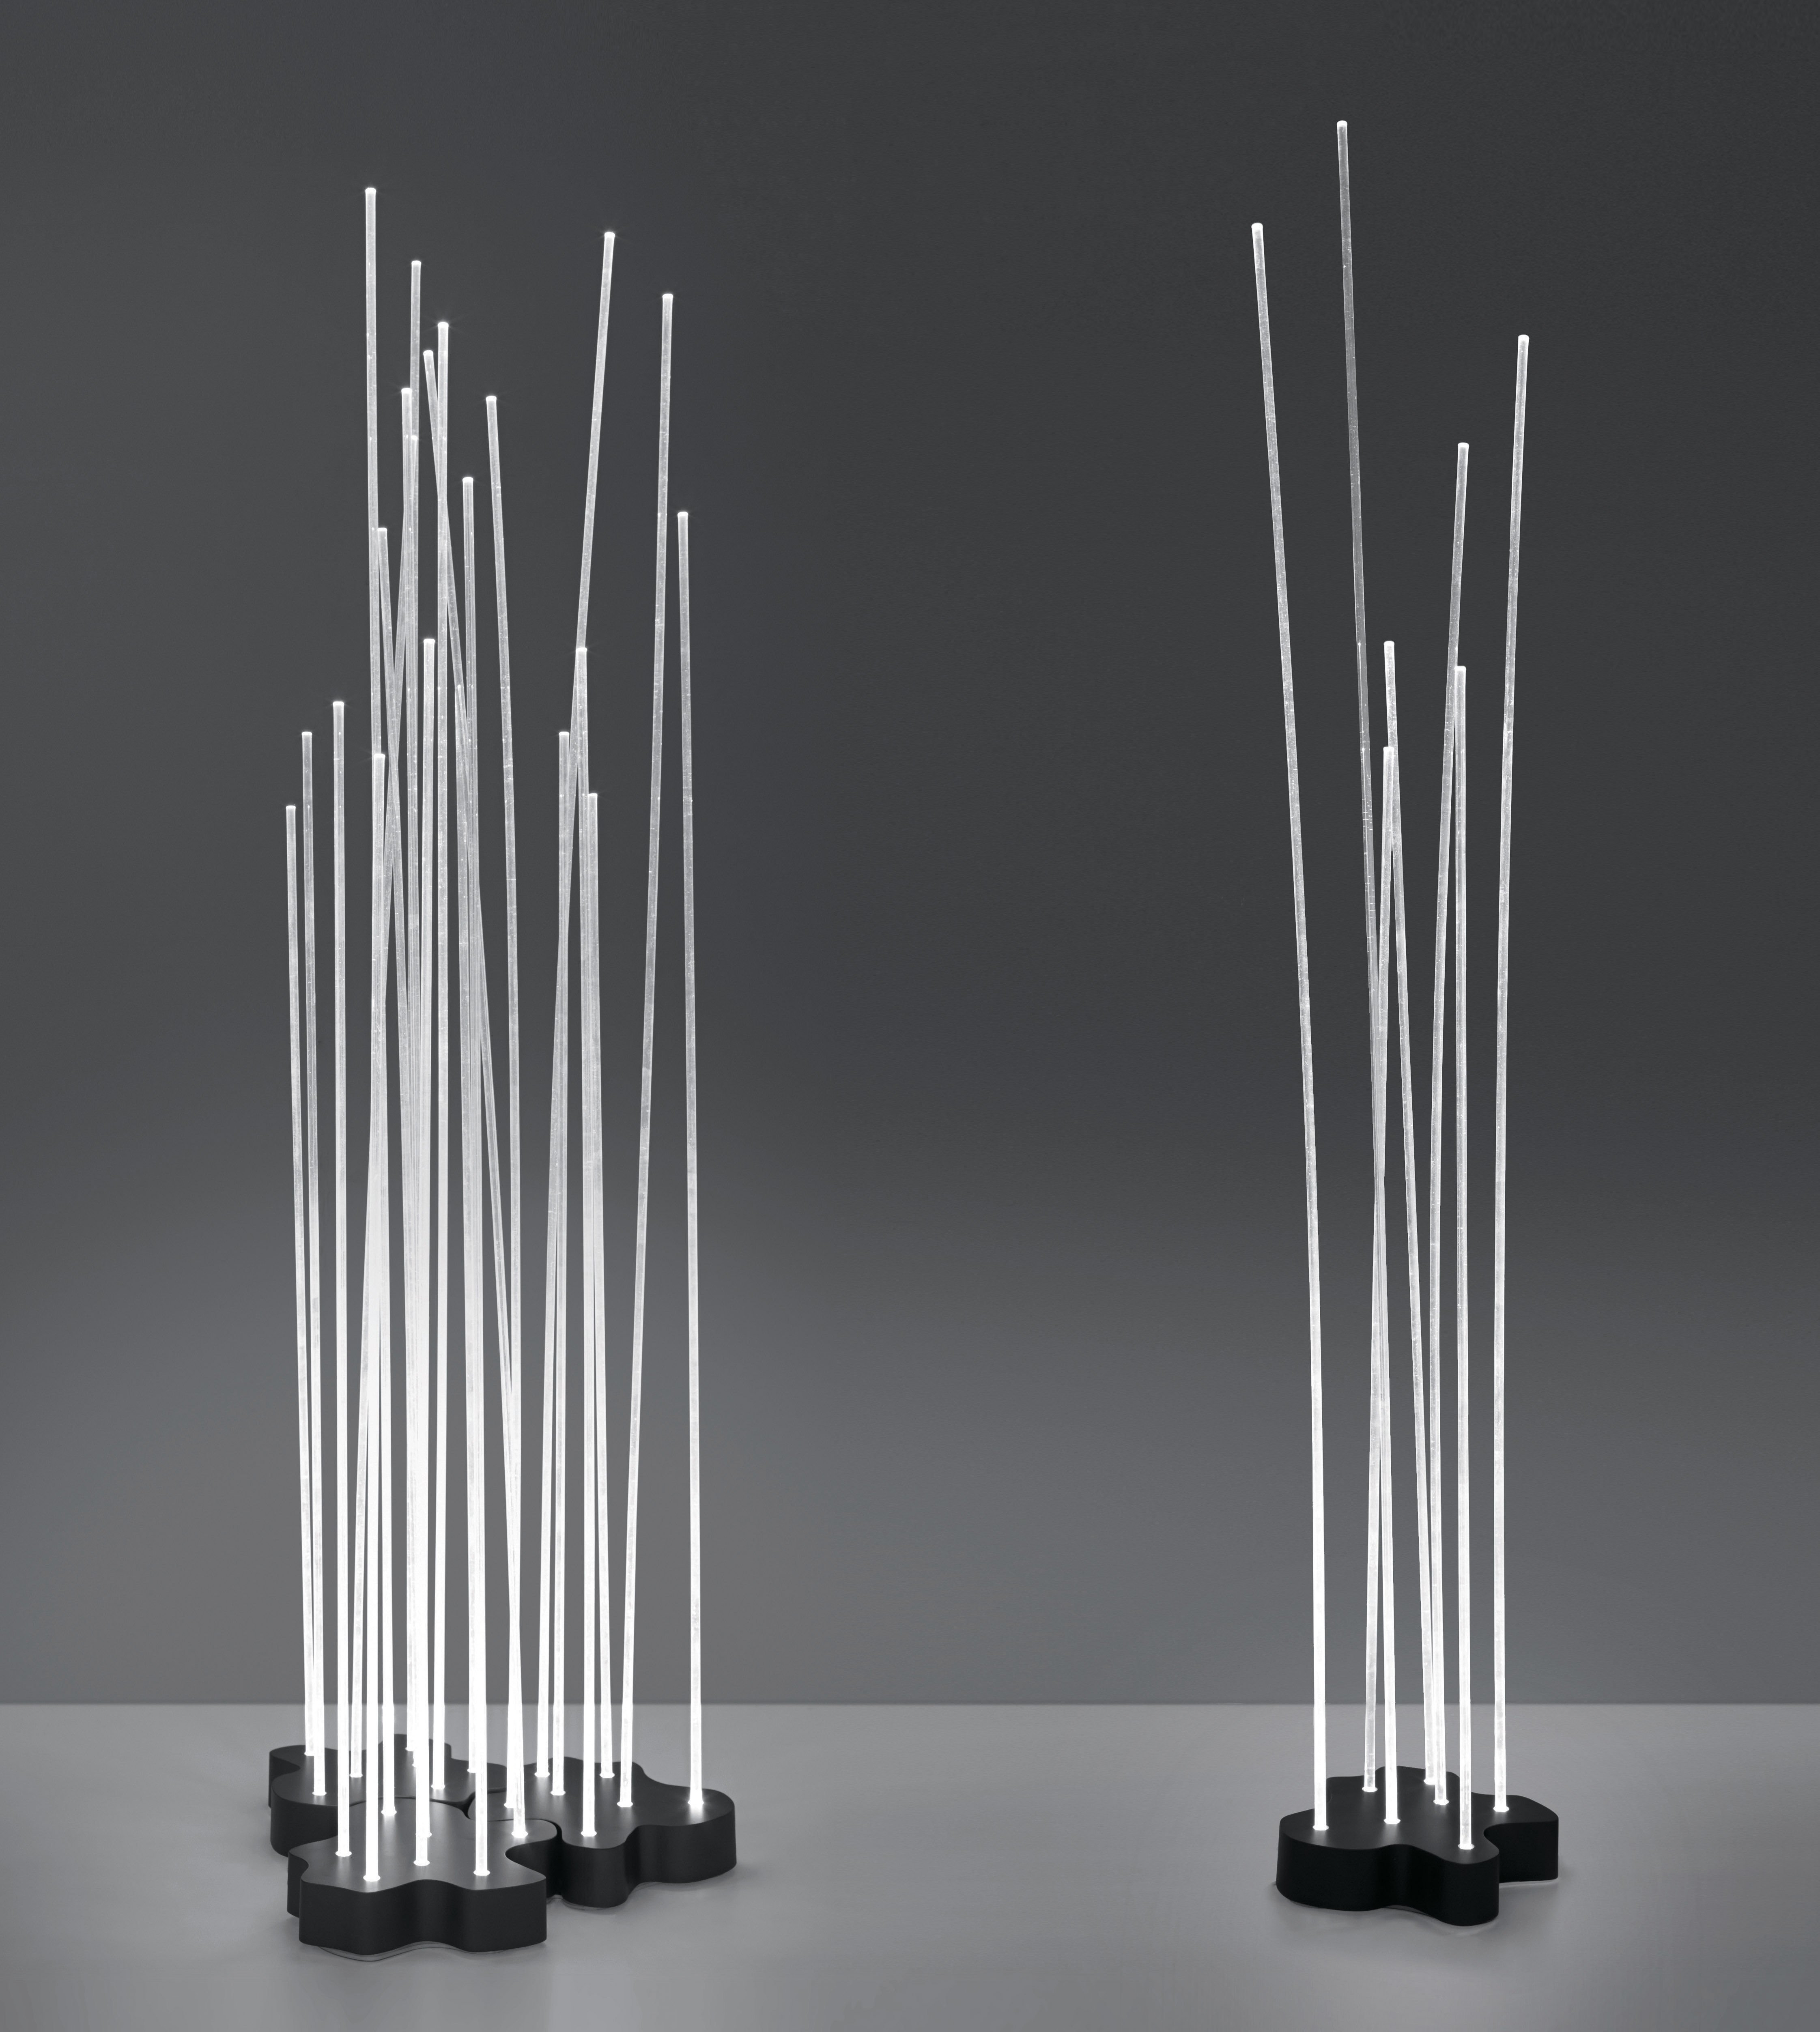 reeds led outdoor lampada a stelo - / 7 steli bianco / base grigio